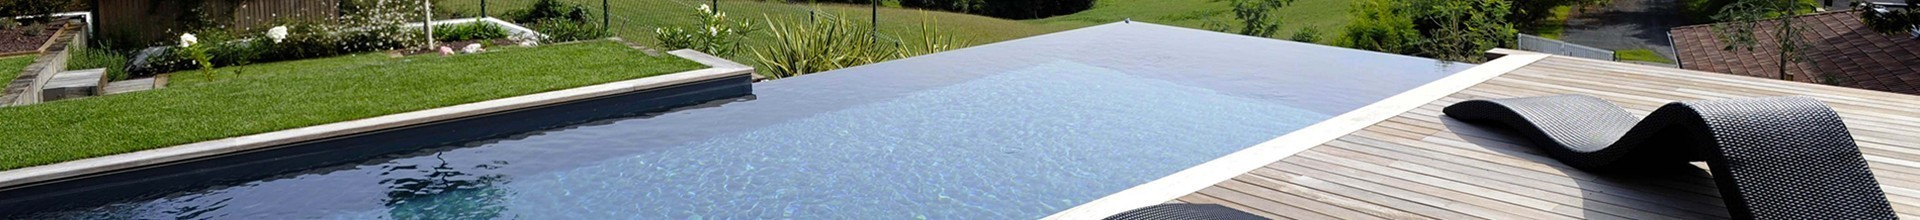 Direct usine, piscine coque prix Cantal